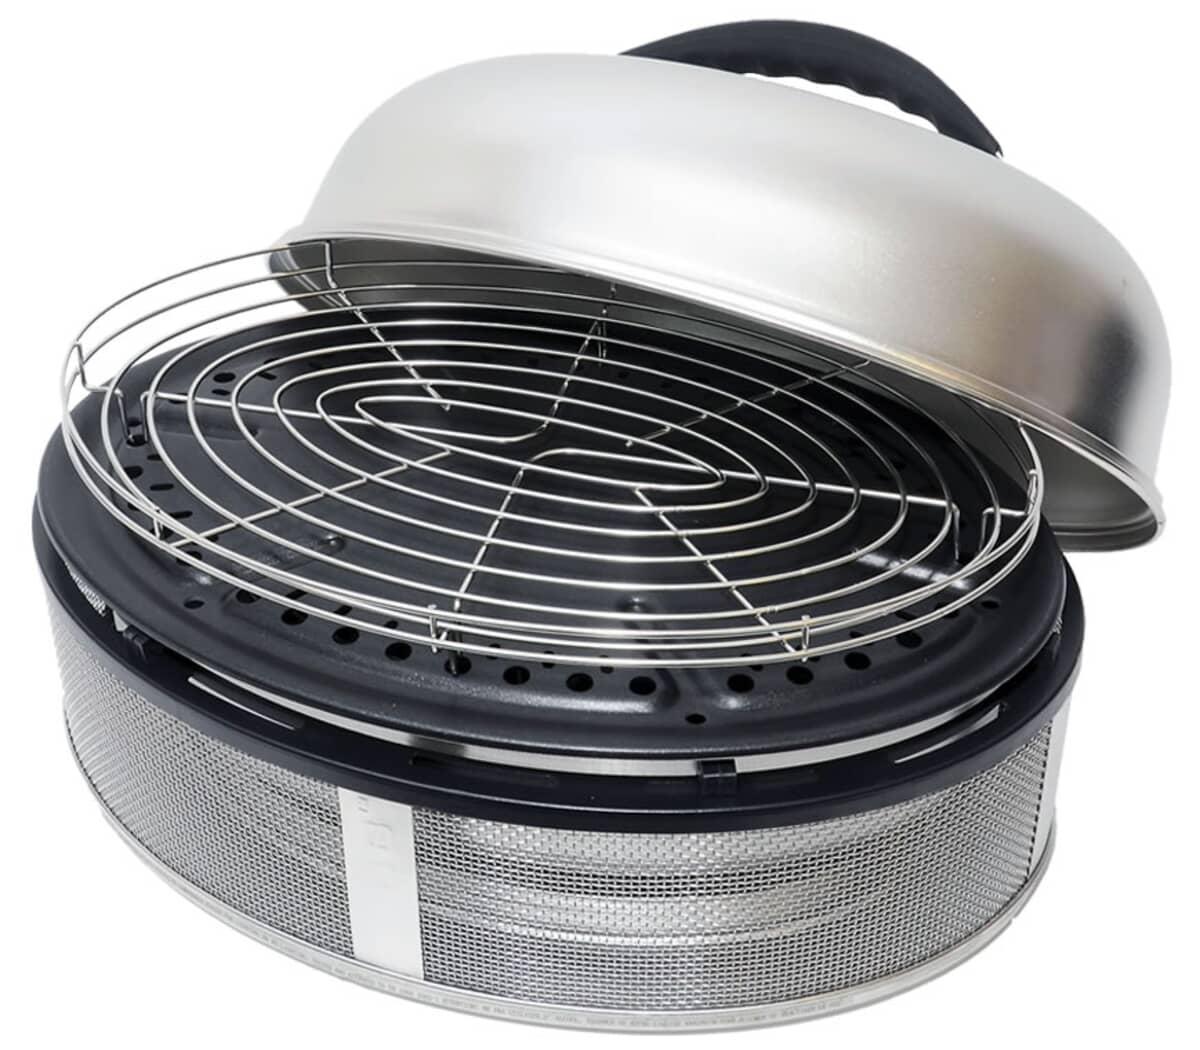 Cobb grill gas